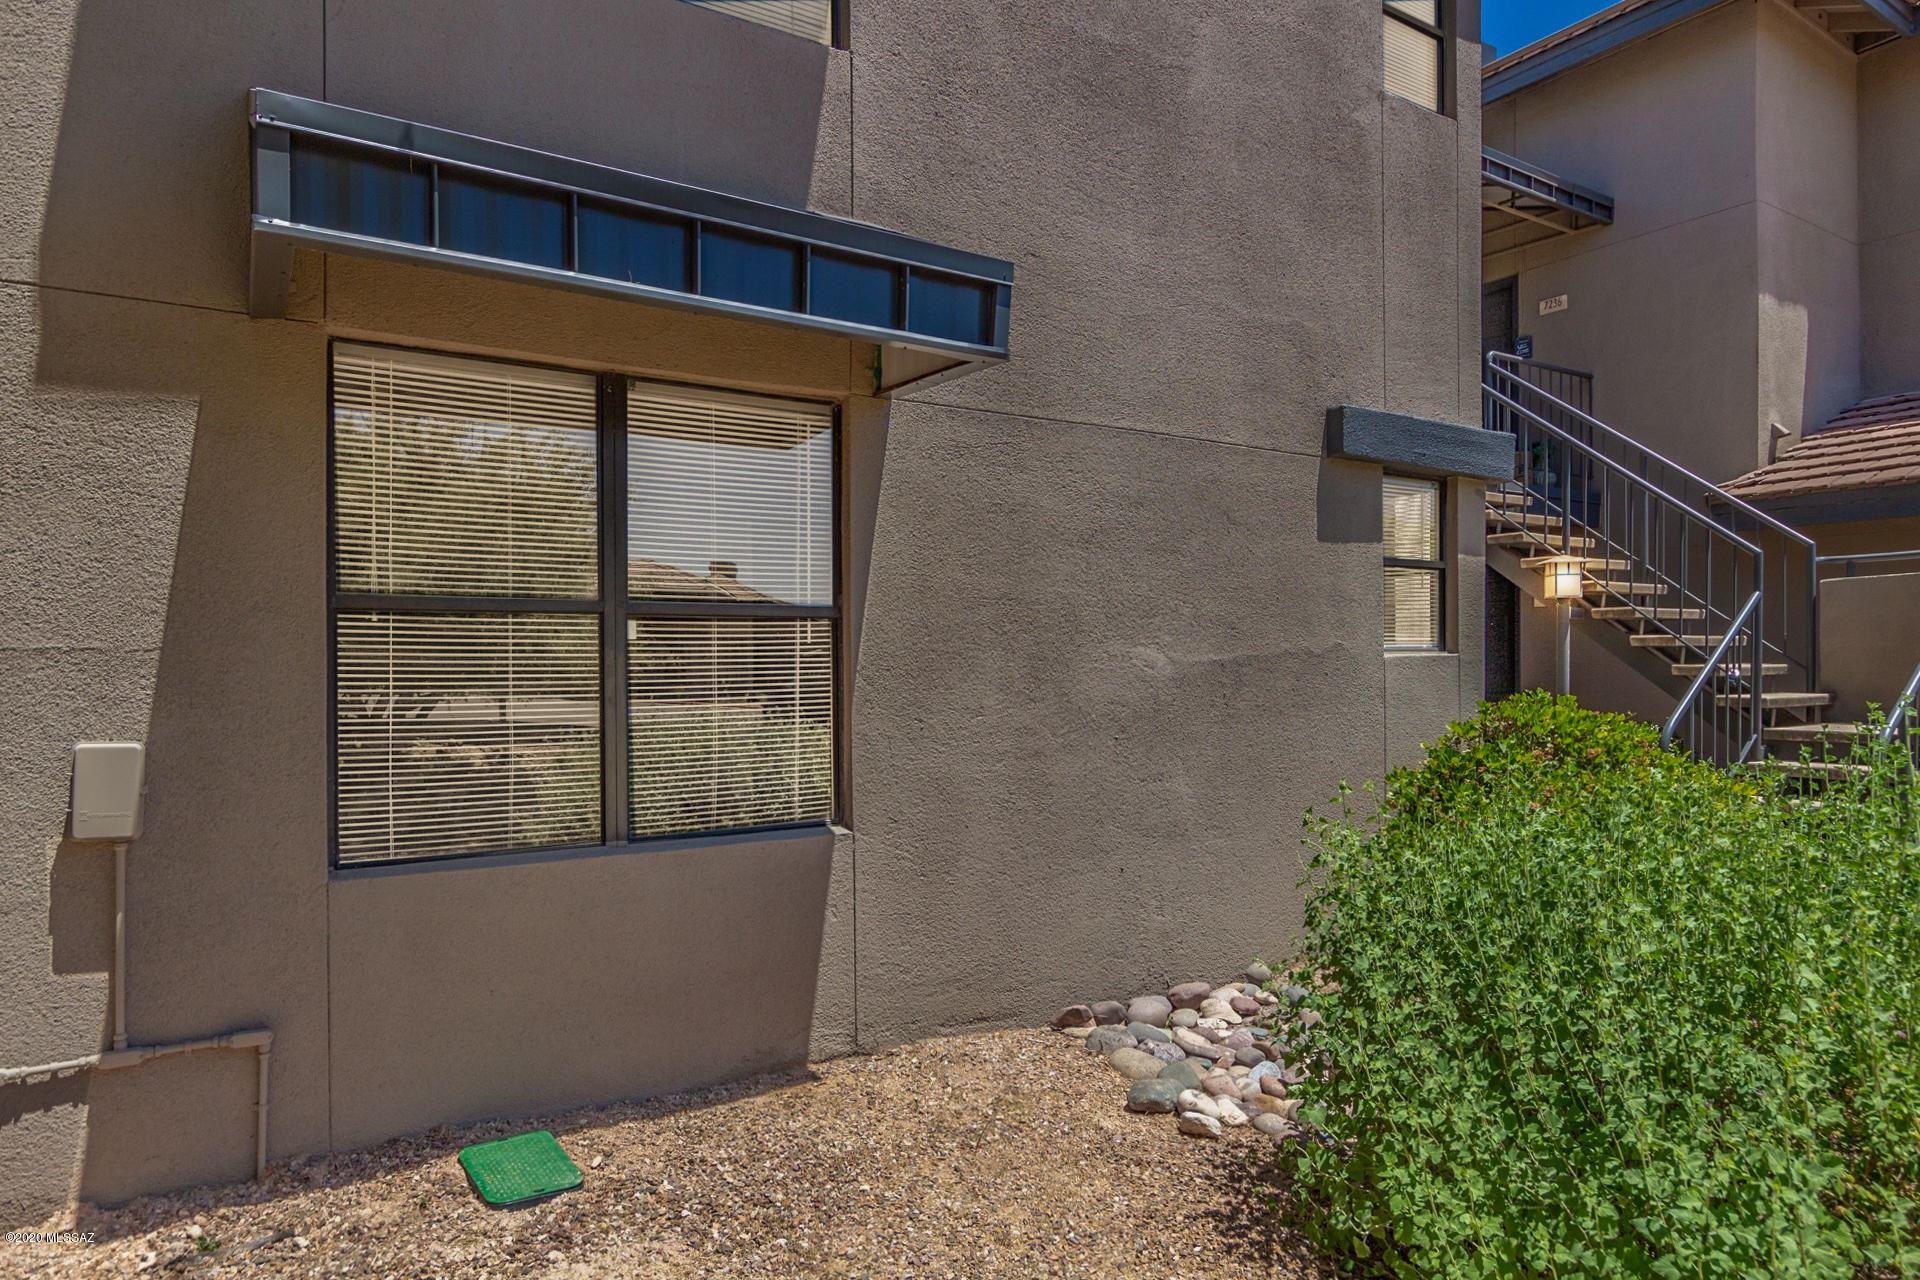 5800 N Kolb Road #7137, Tucson, AZ 85750 - MLS#: 22011314